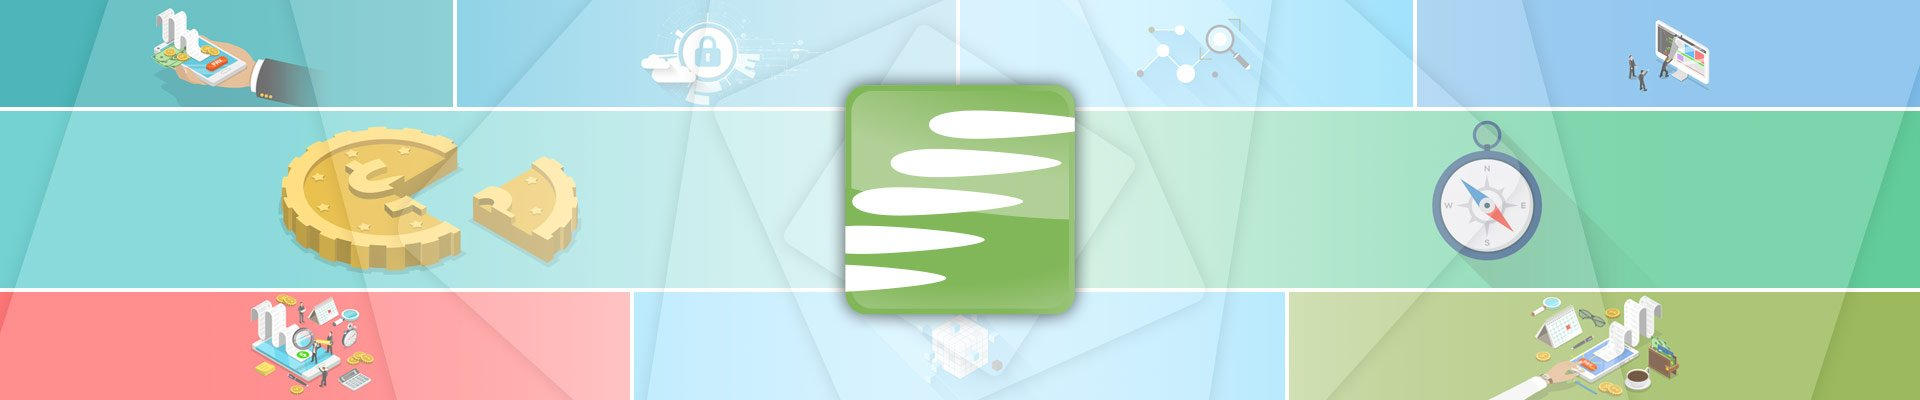 ImplantBase-Blog-Header-YearEnd-2